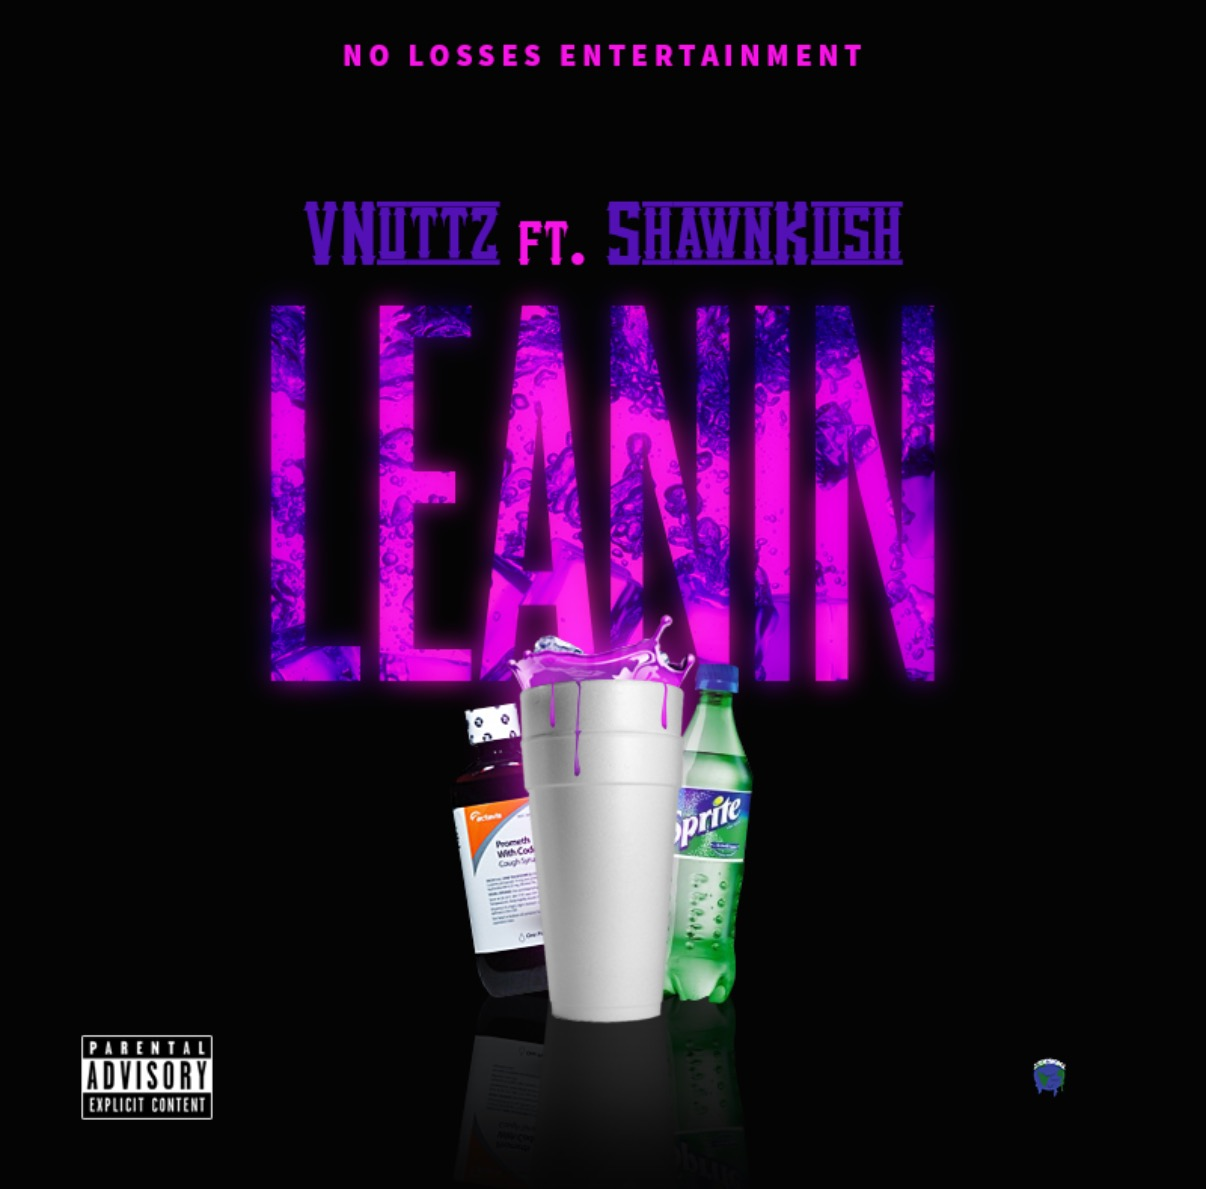 VNuttz ft Shawn Kush – Leanin